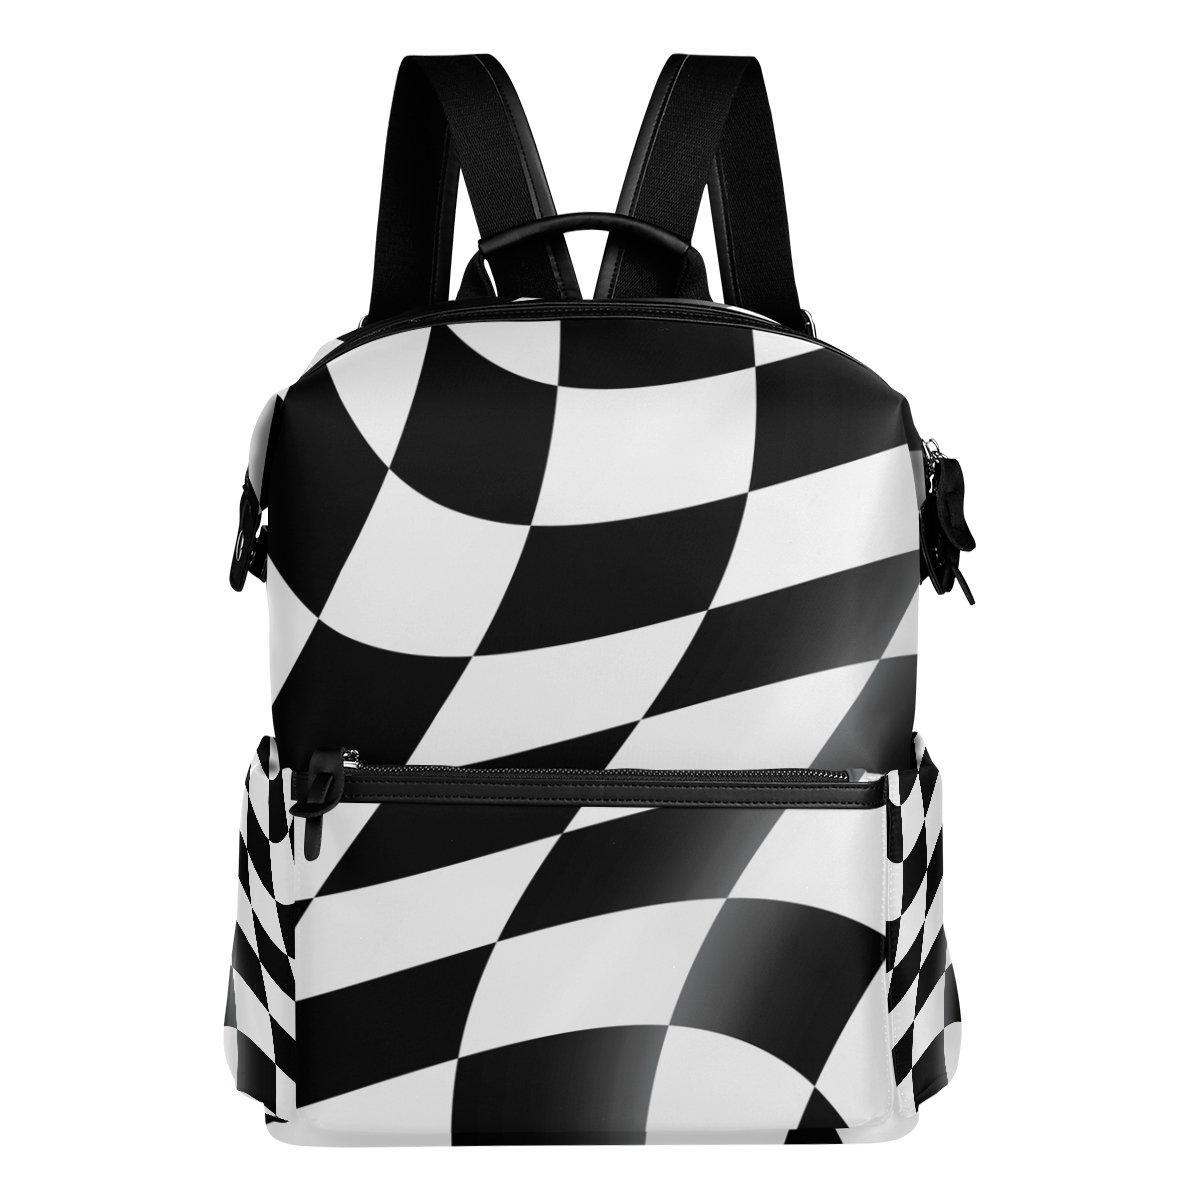 COOSUN Zaino da viaggio Bianco e nero cheked Racing Flag scuola zaino Multi